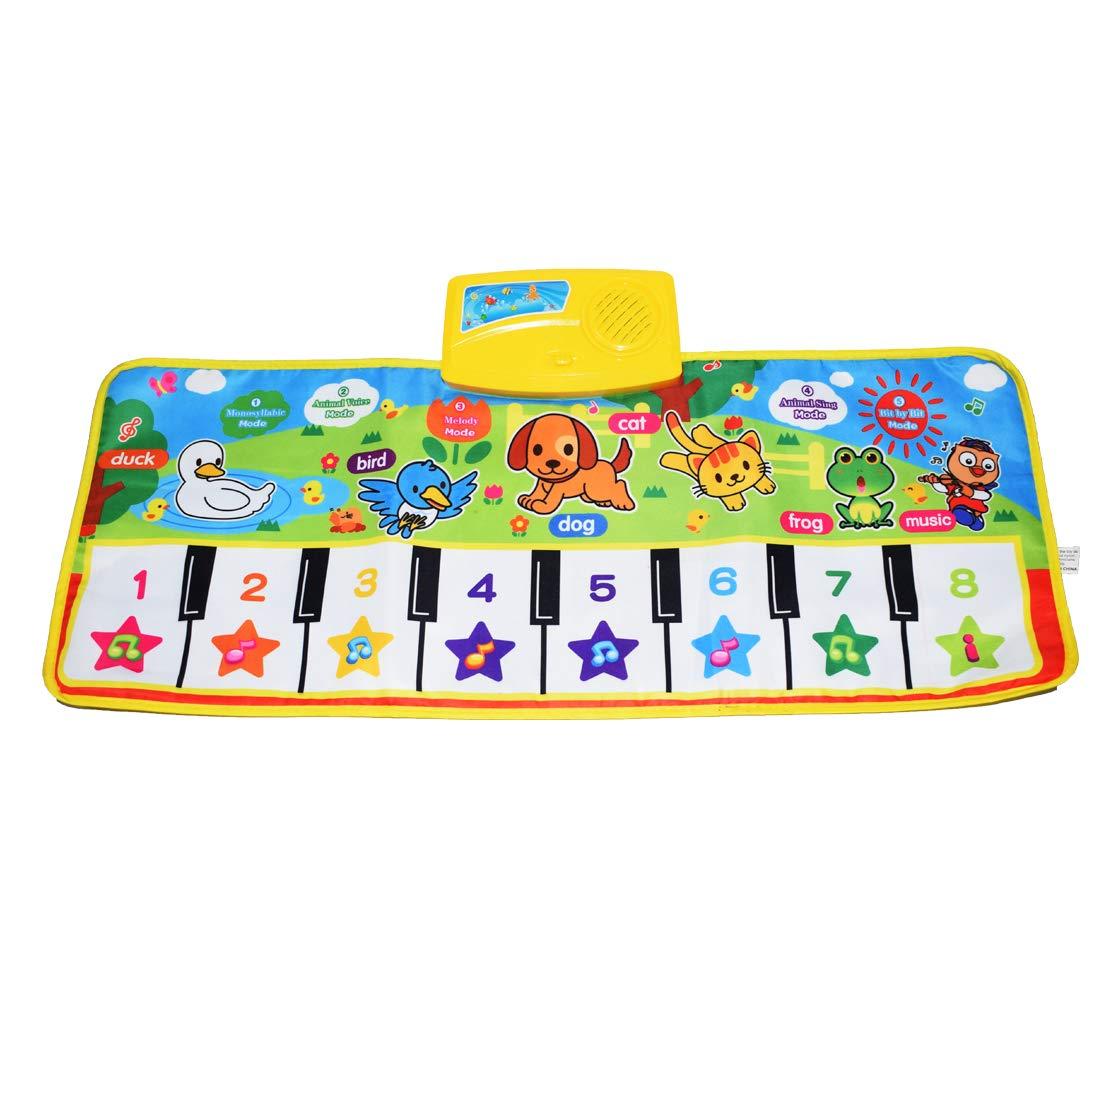 KAREZONINE Piano Mat, Kids Keyboard Mat Playmat Education Toy Birthday Christmas Easter Day Gift for Kids Boys Girls by KAREZONINE